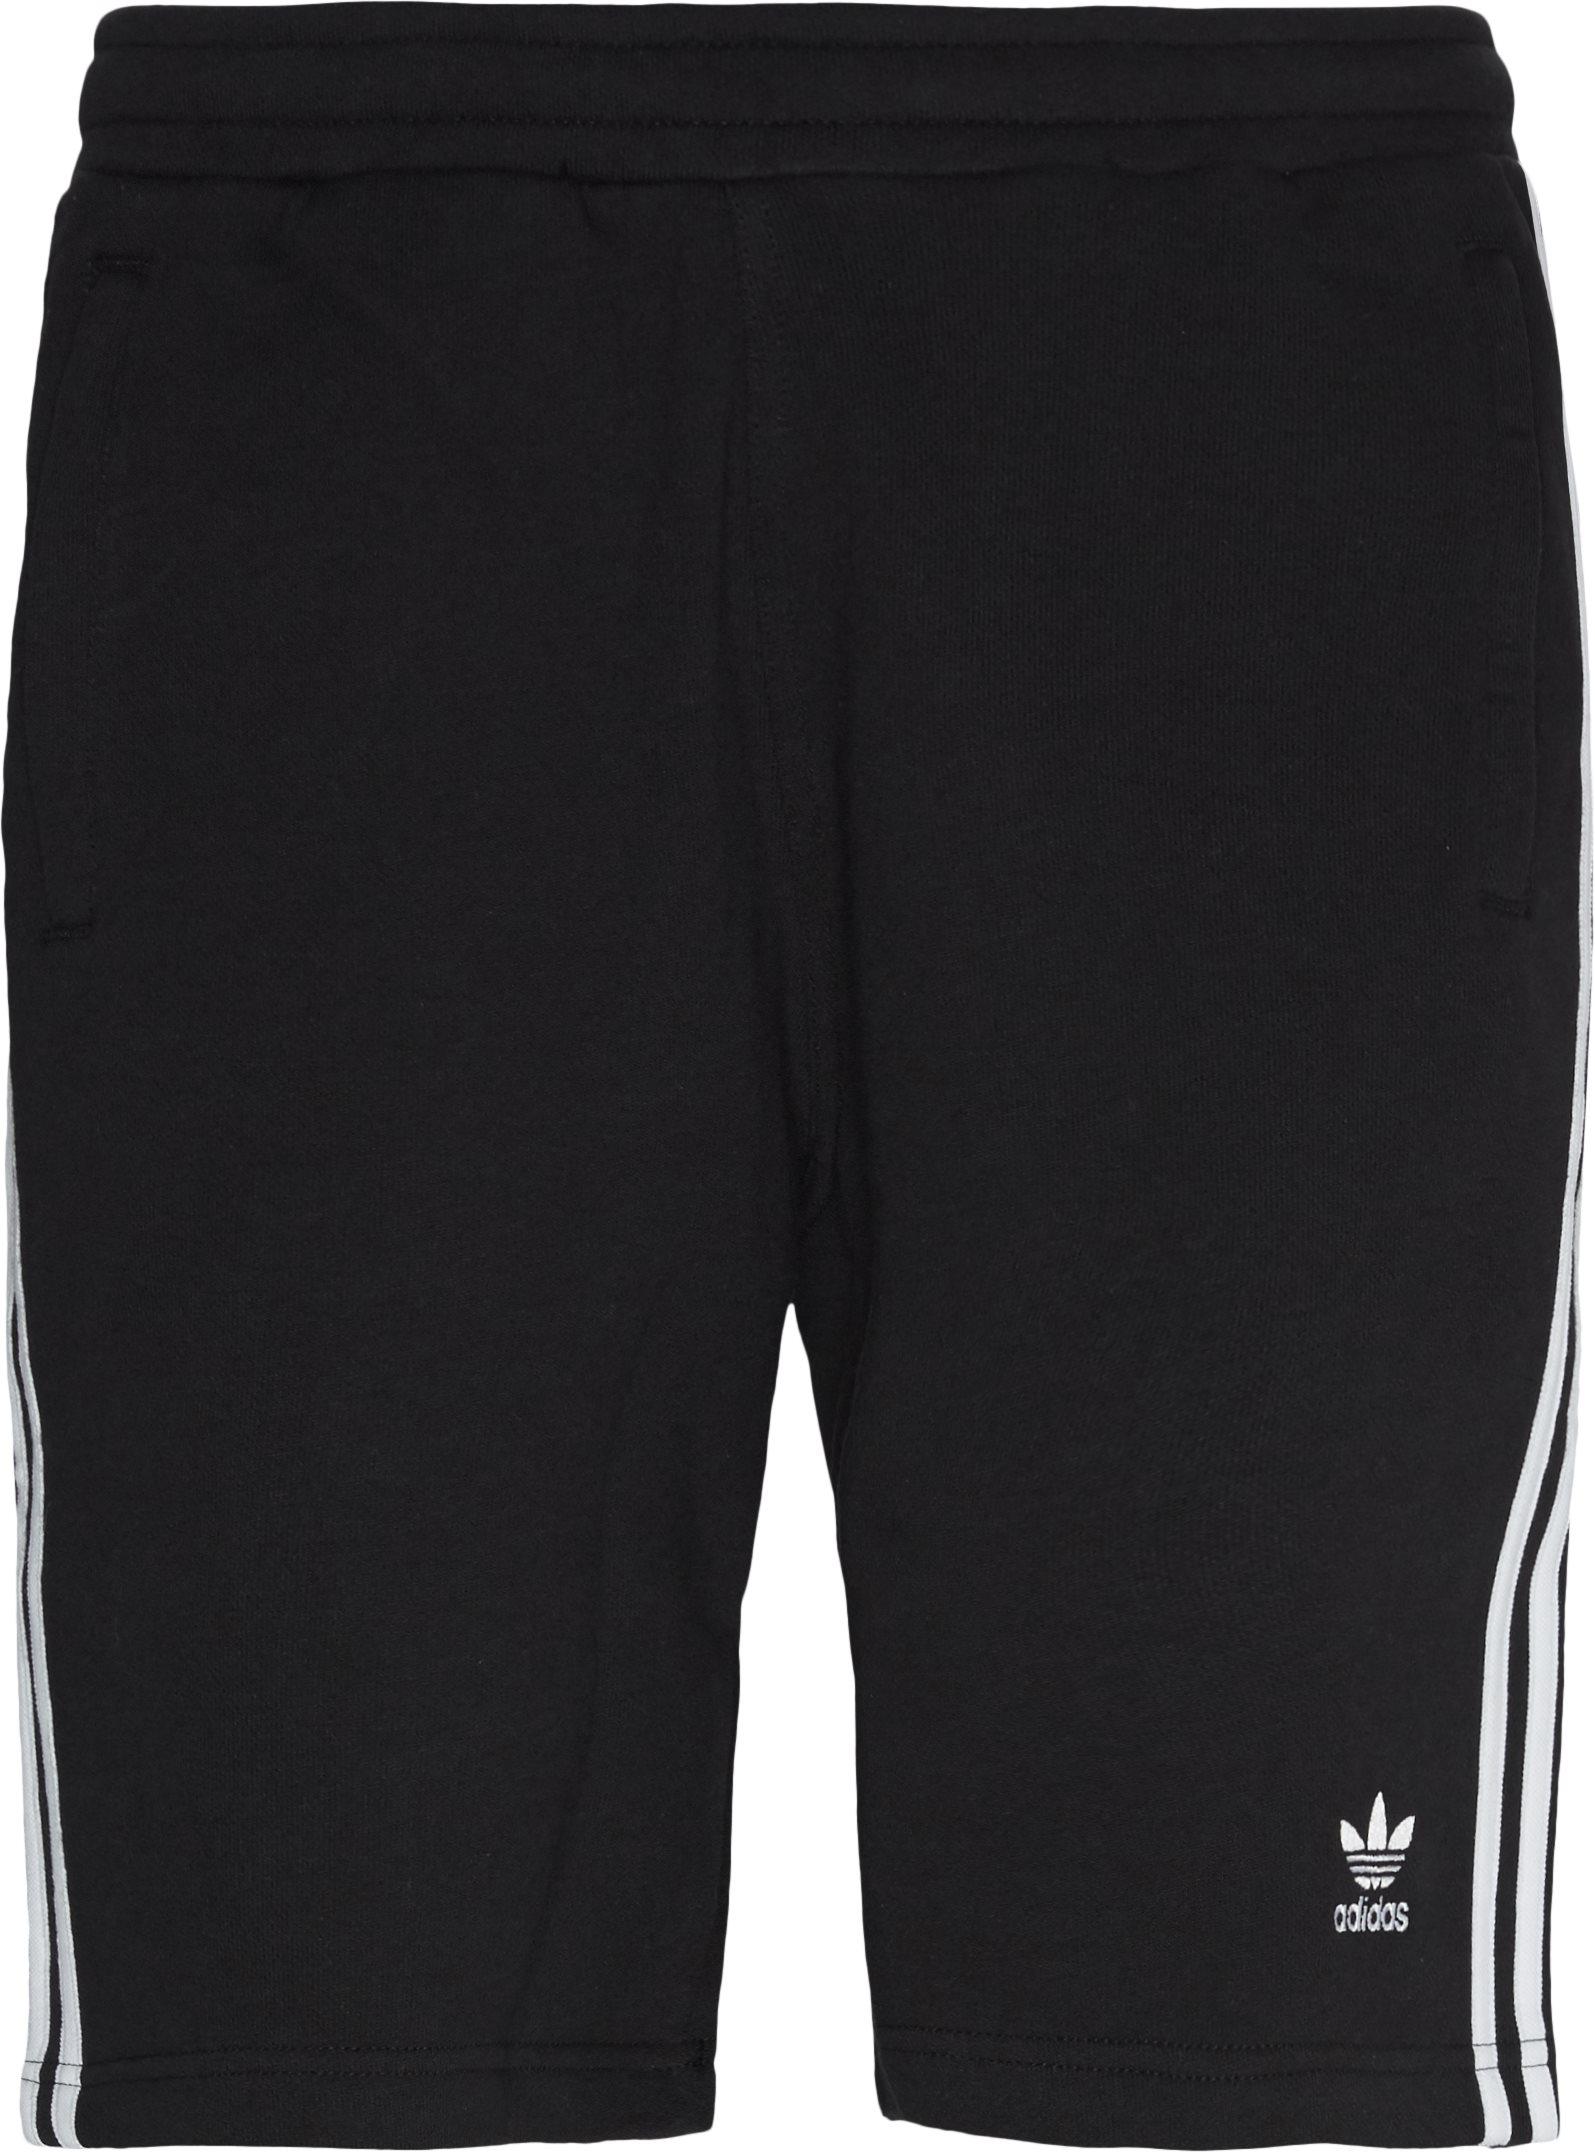 Shorts - Straight fit - Svart